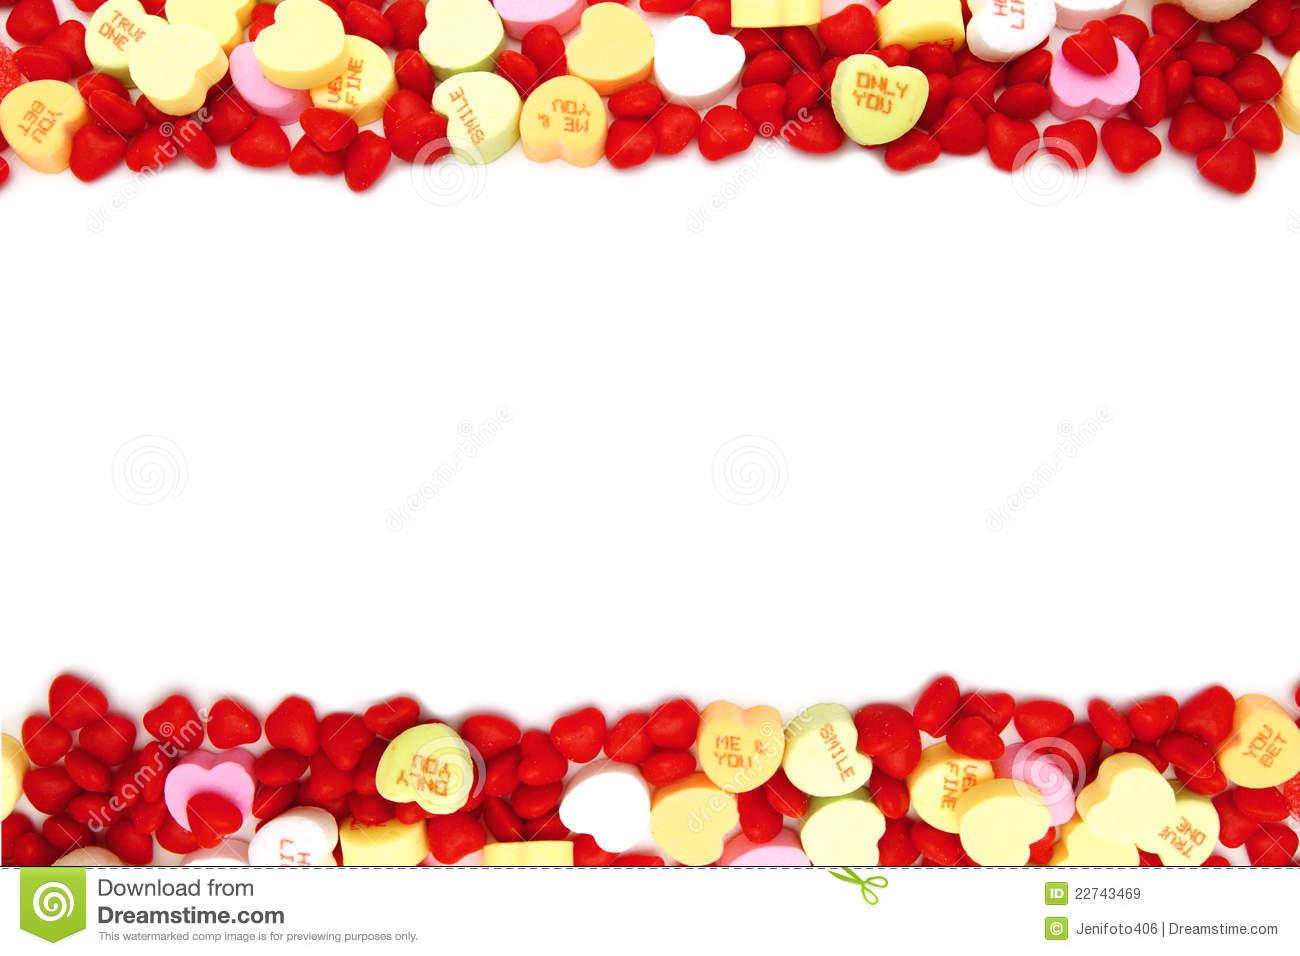 Clip Art Valentines Day Borders Clip Art valentine day borders clipart valentines 39 s